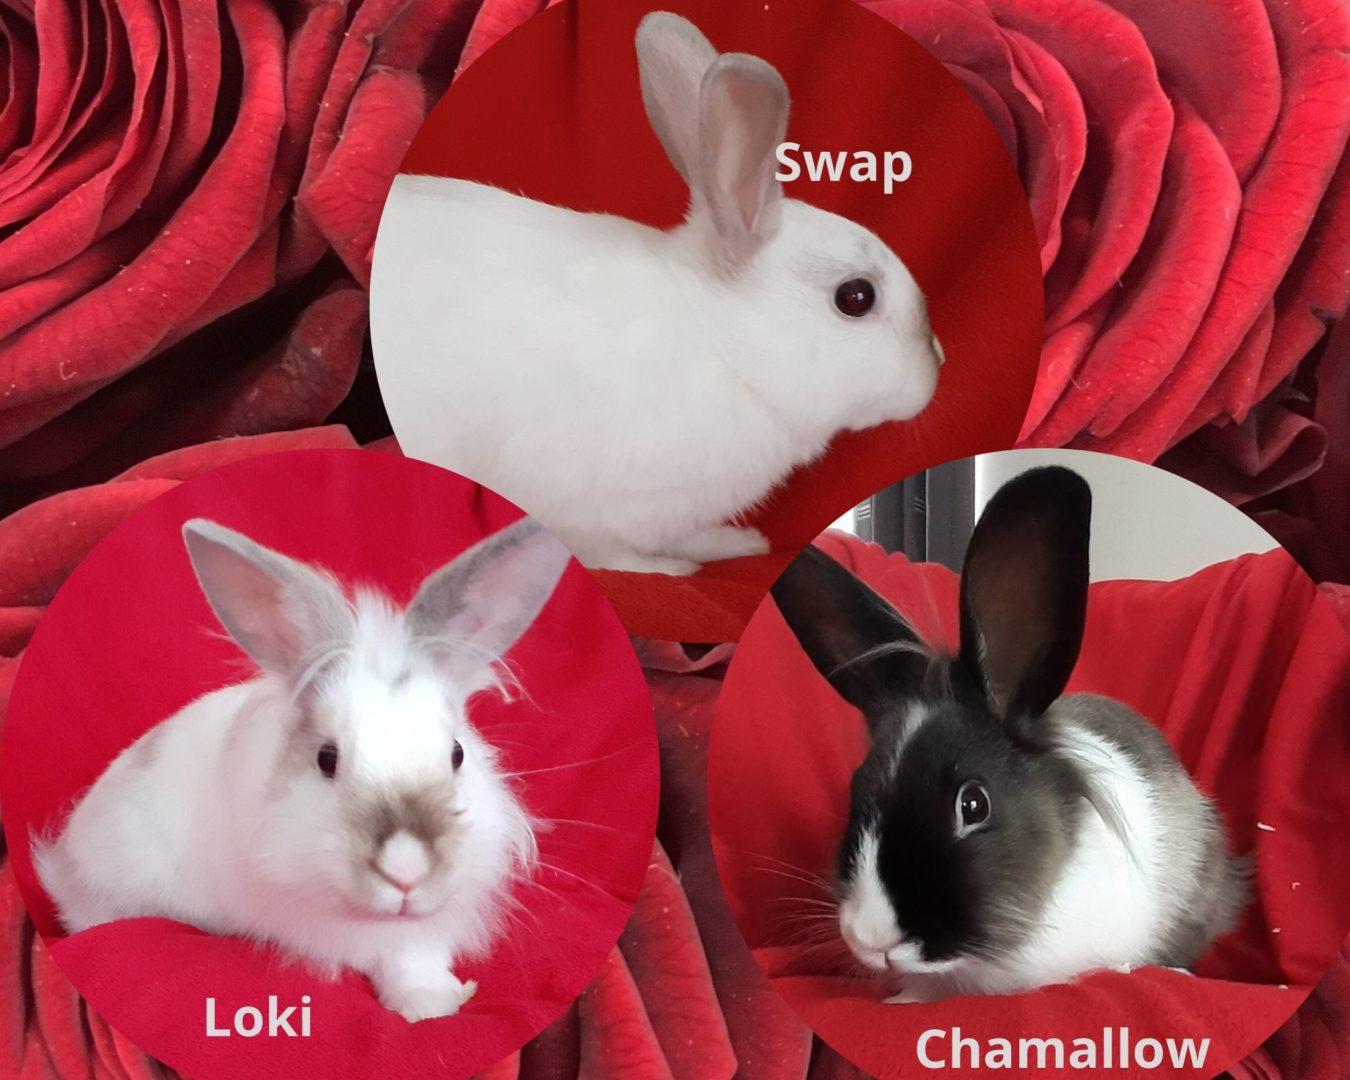 Swap – Chamallow – Loki ♂ lapereaux – FA